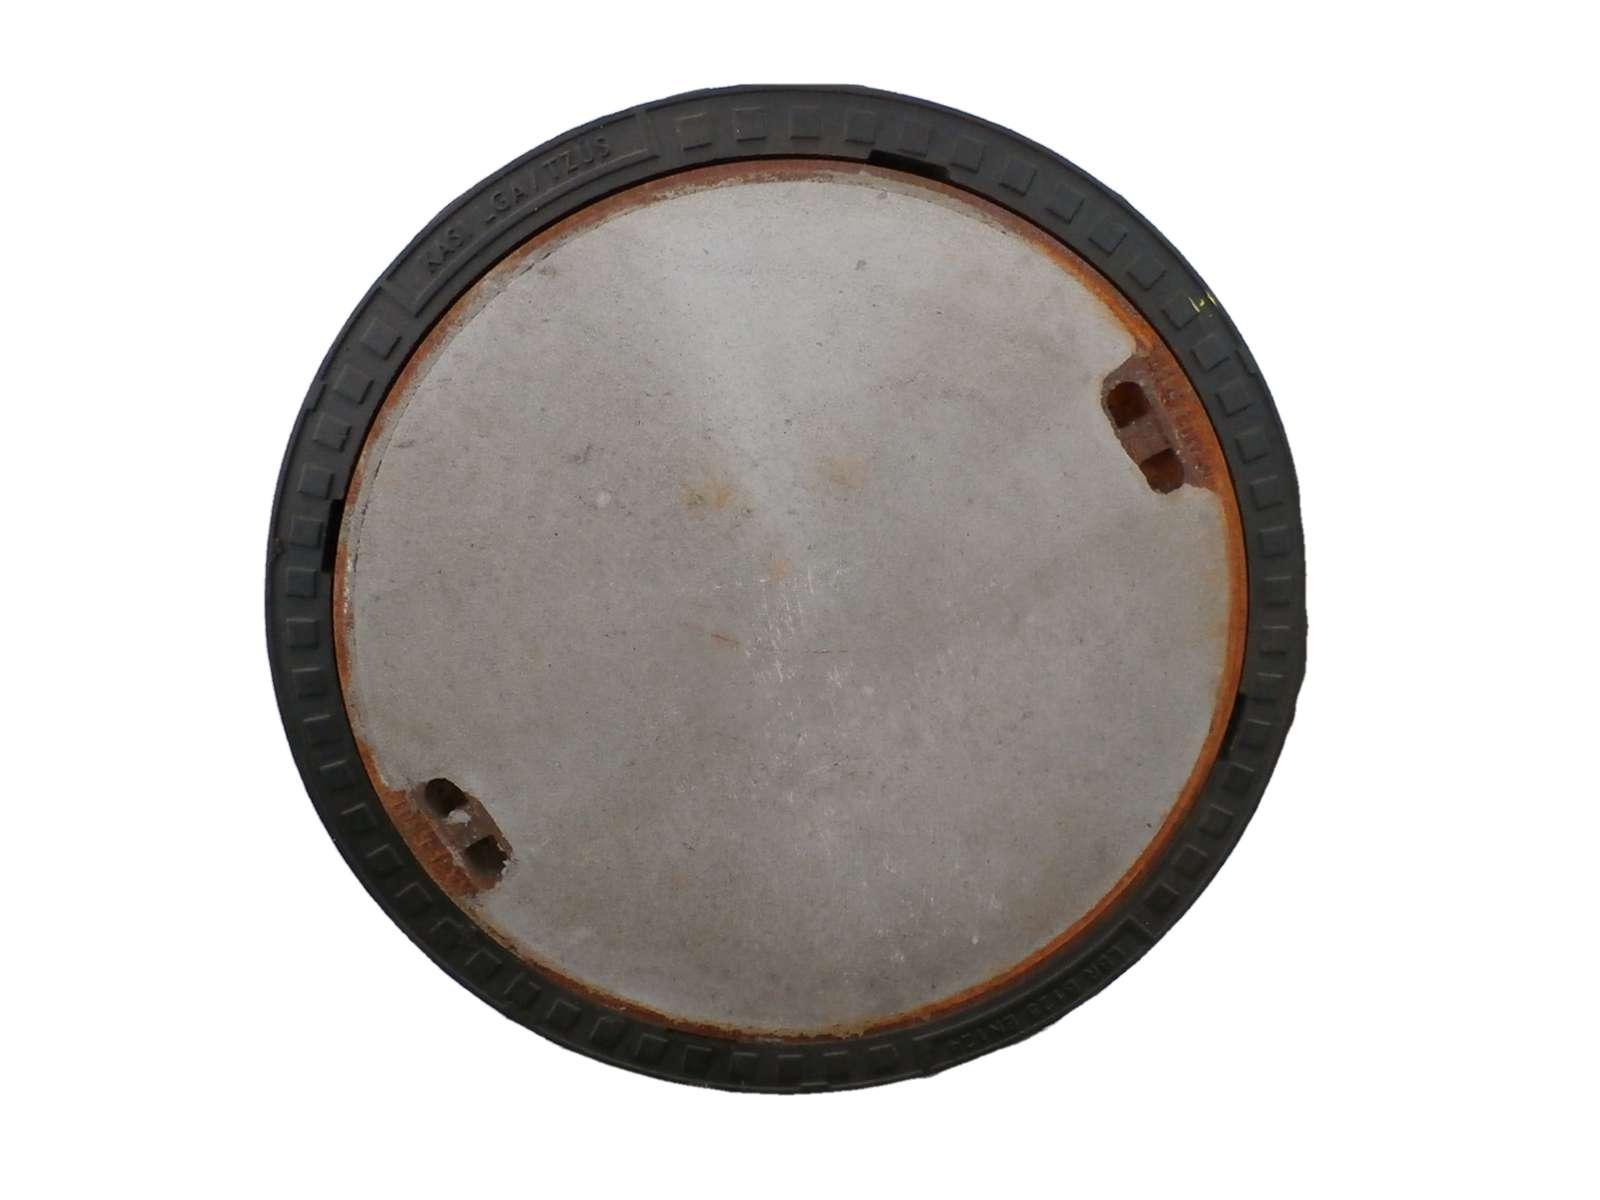 poklop šachtový kruhový